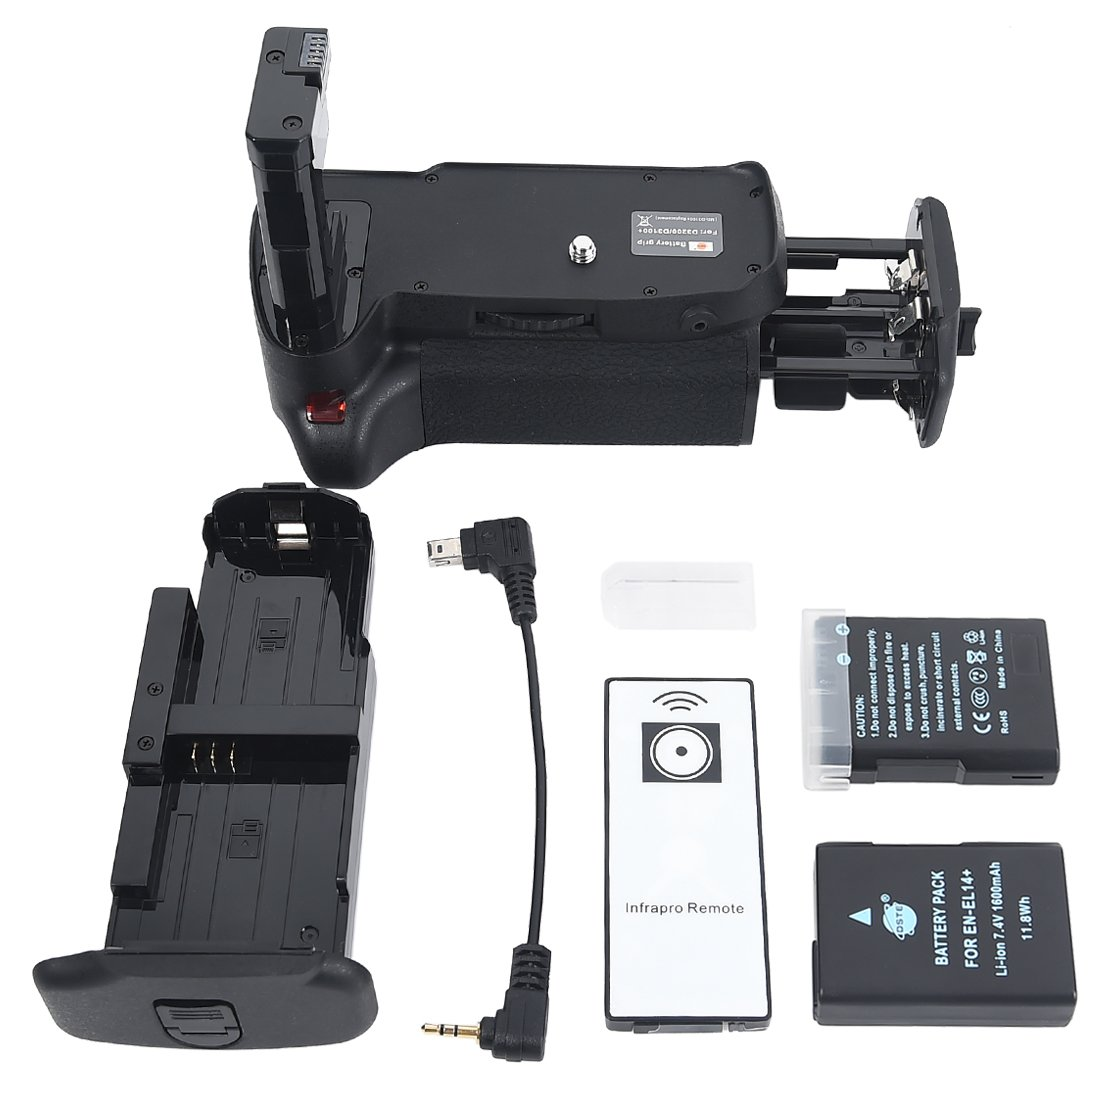 DSTE Pro IR Remote MB-D31 Vertical Battery Grip + 2x EN-EL14 EN-EL14A for Nikon D3100 D3200 D3300 D5300 SLR Digital Camera